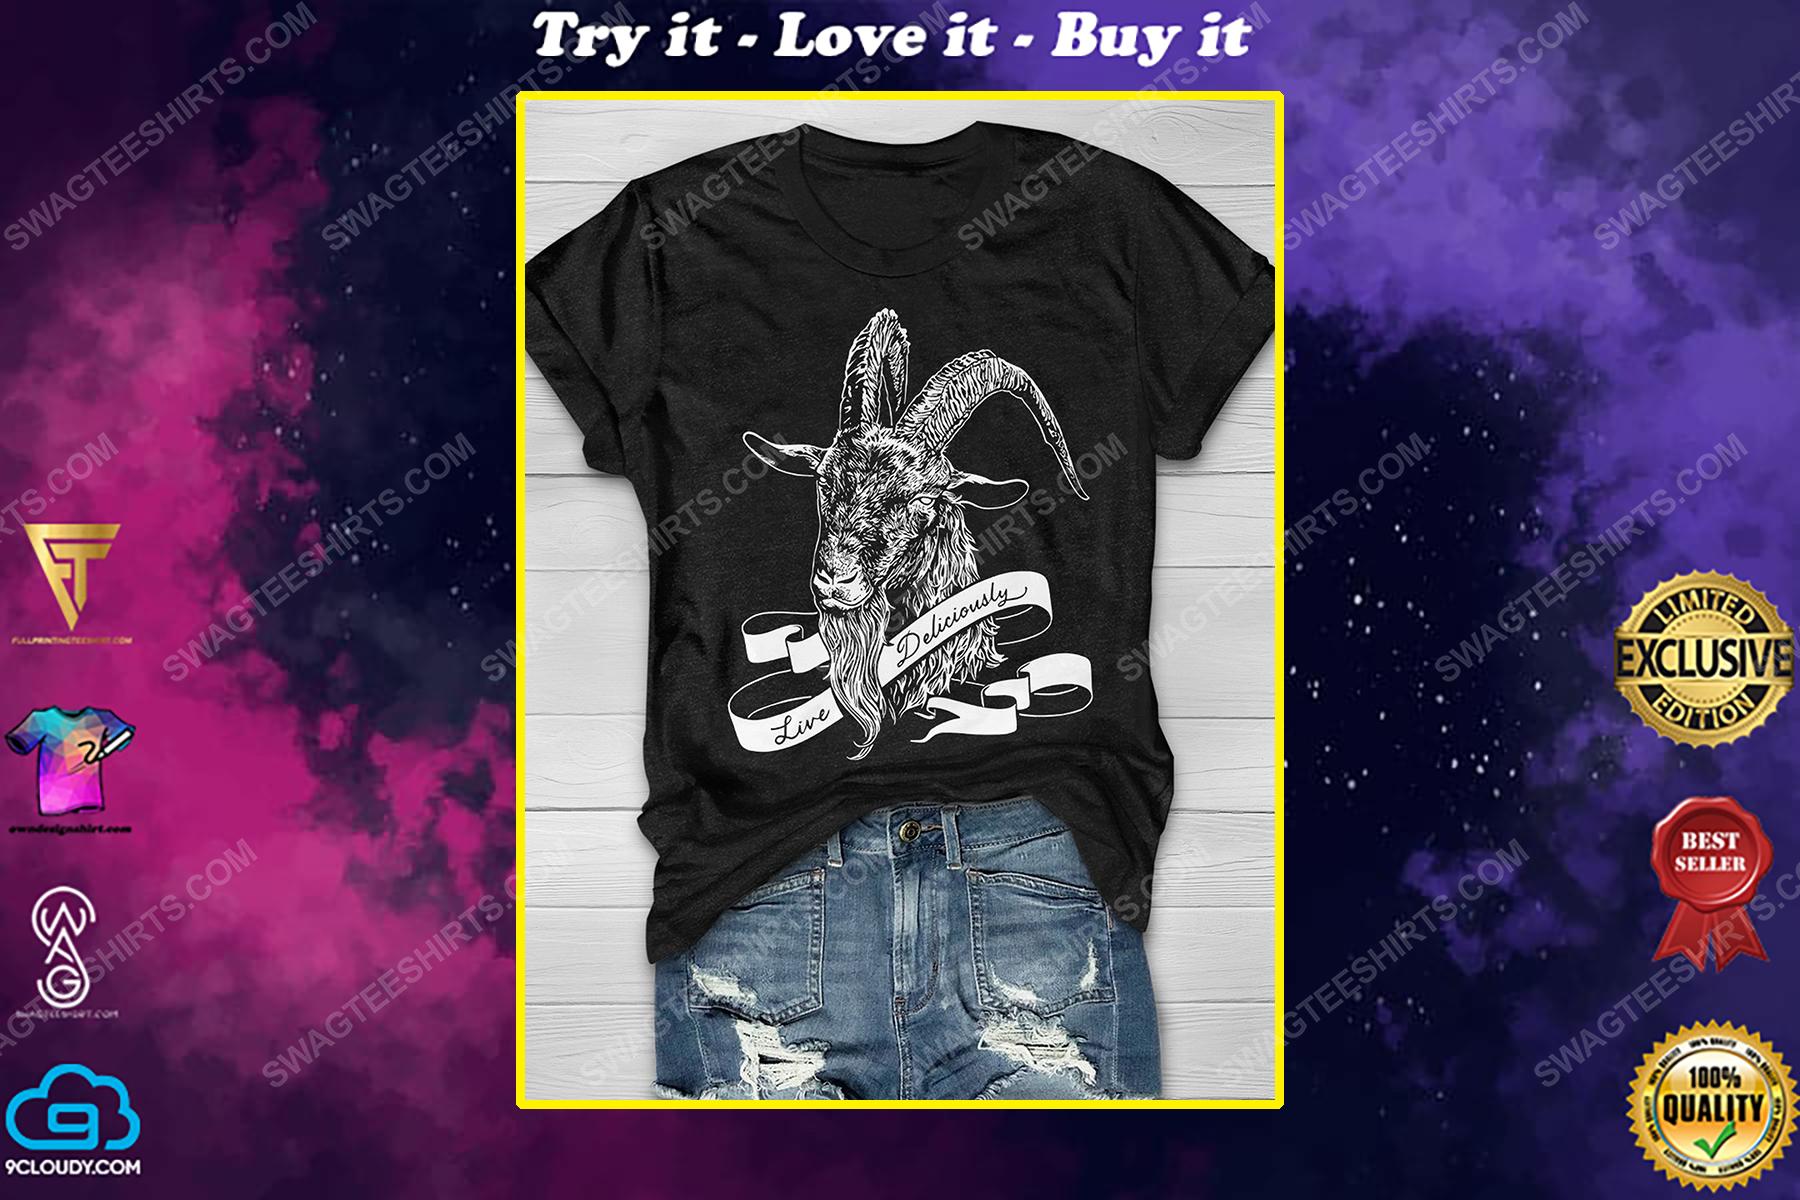 Halloween night live deliciously satanic shirt